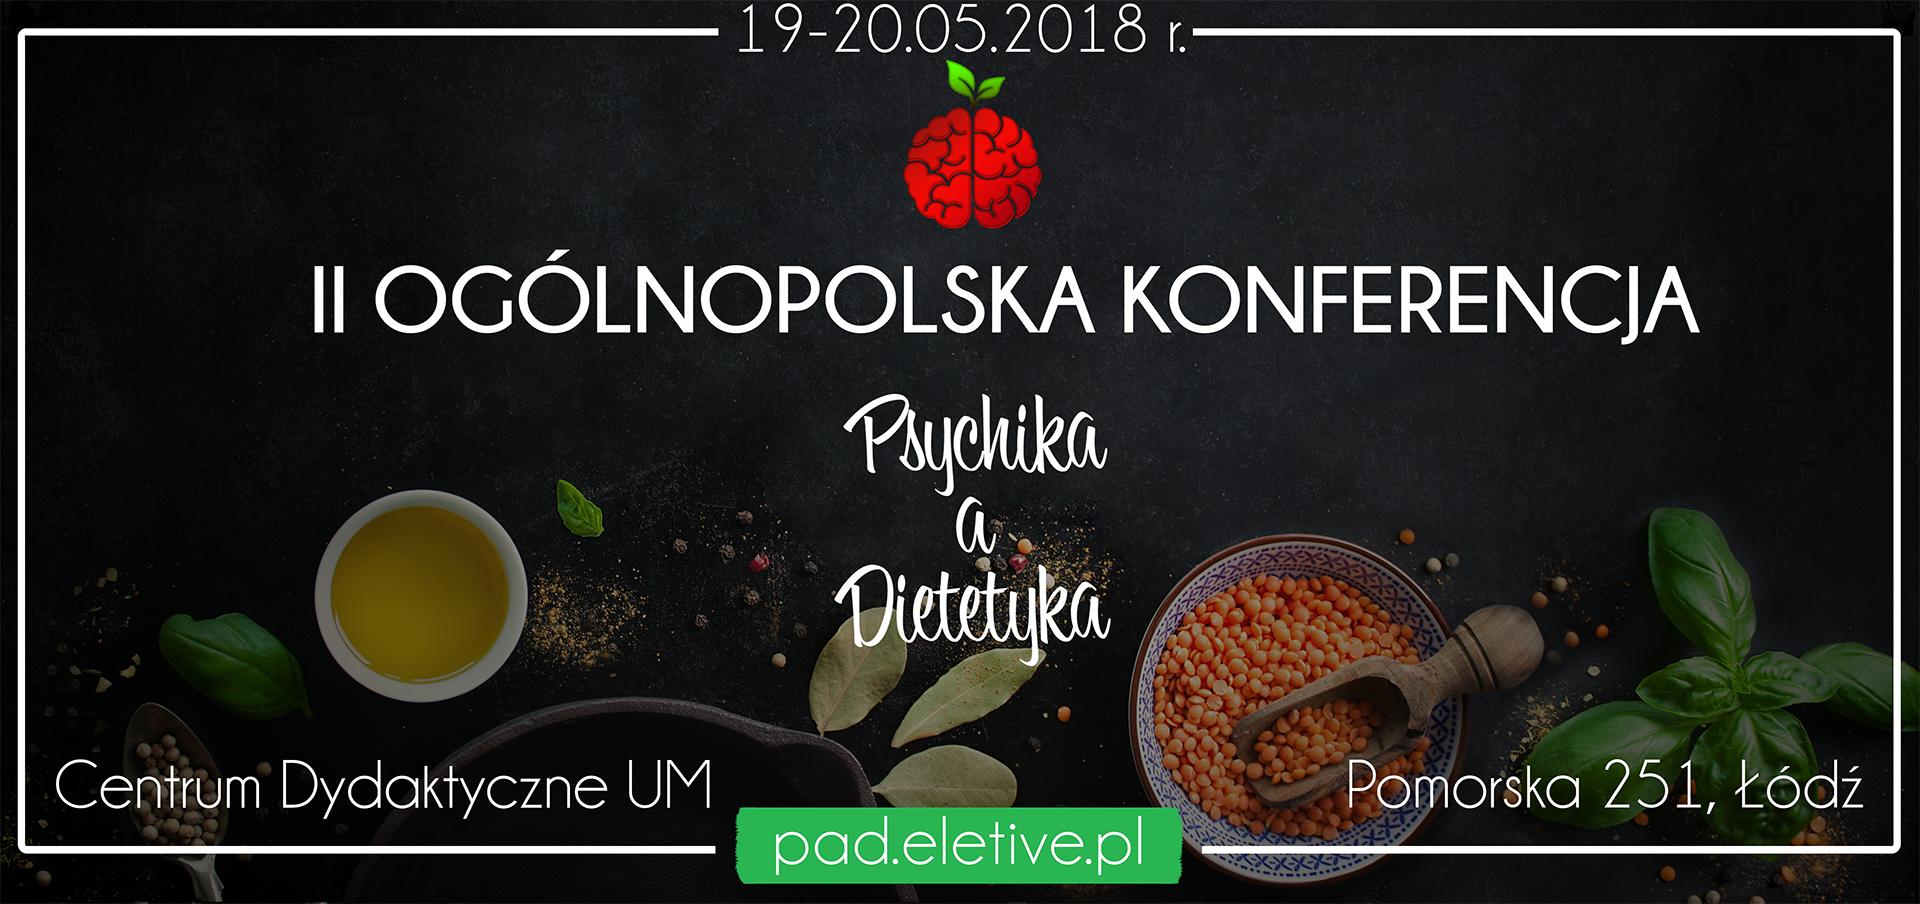 hipoalergiczni-patron-psychika-dietetyka-2018